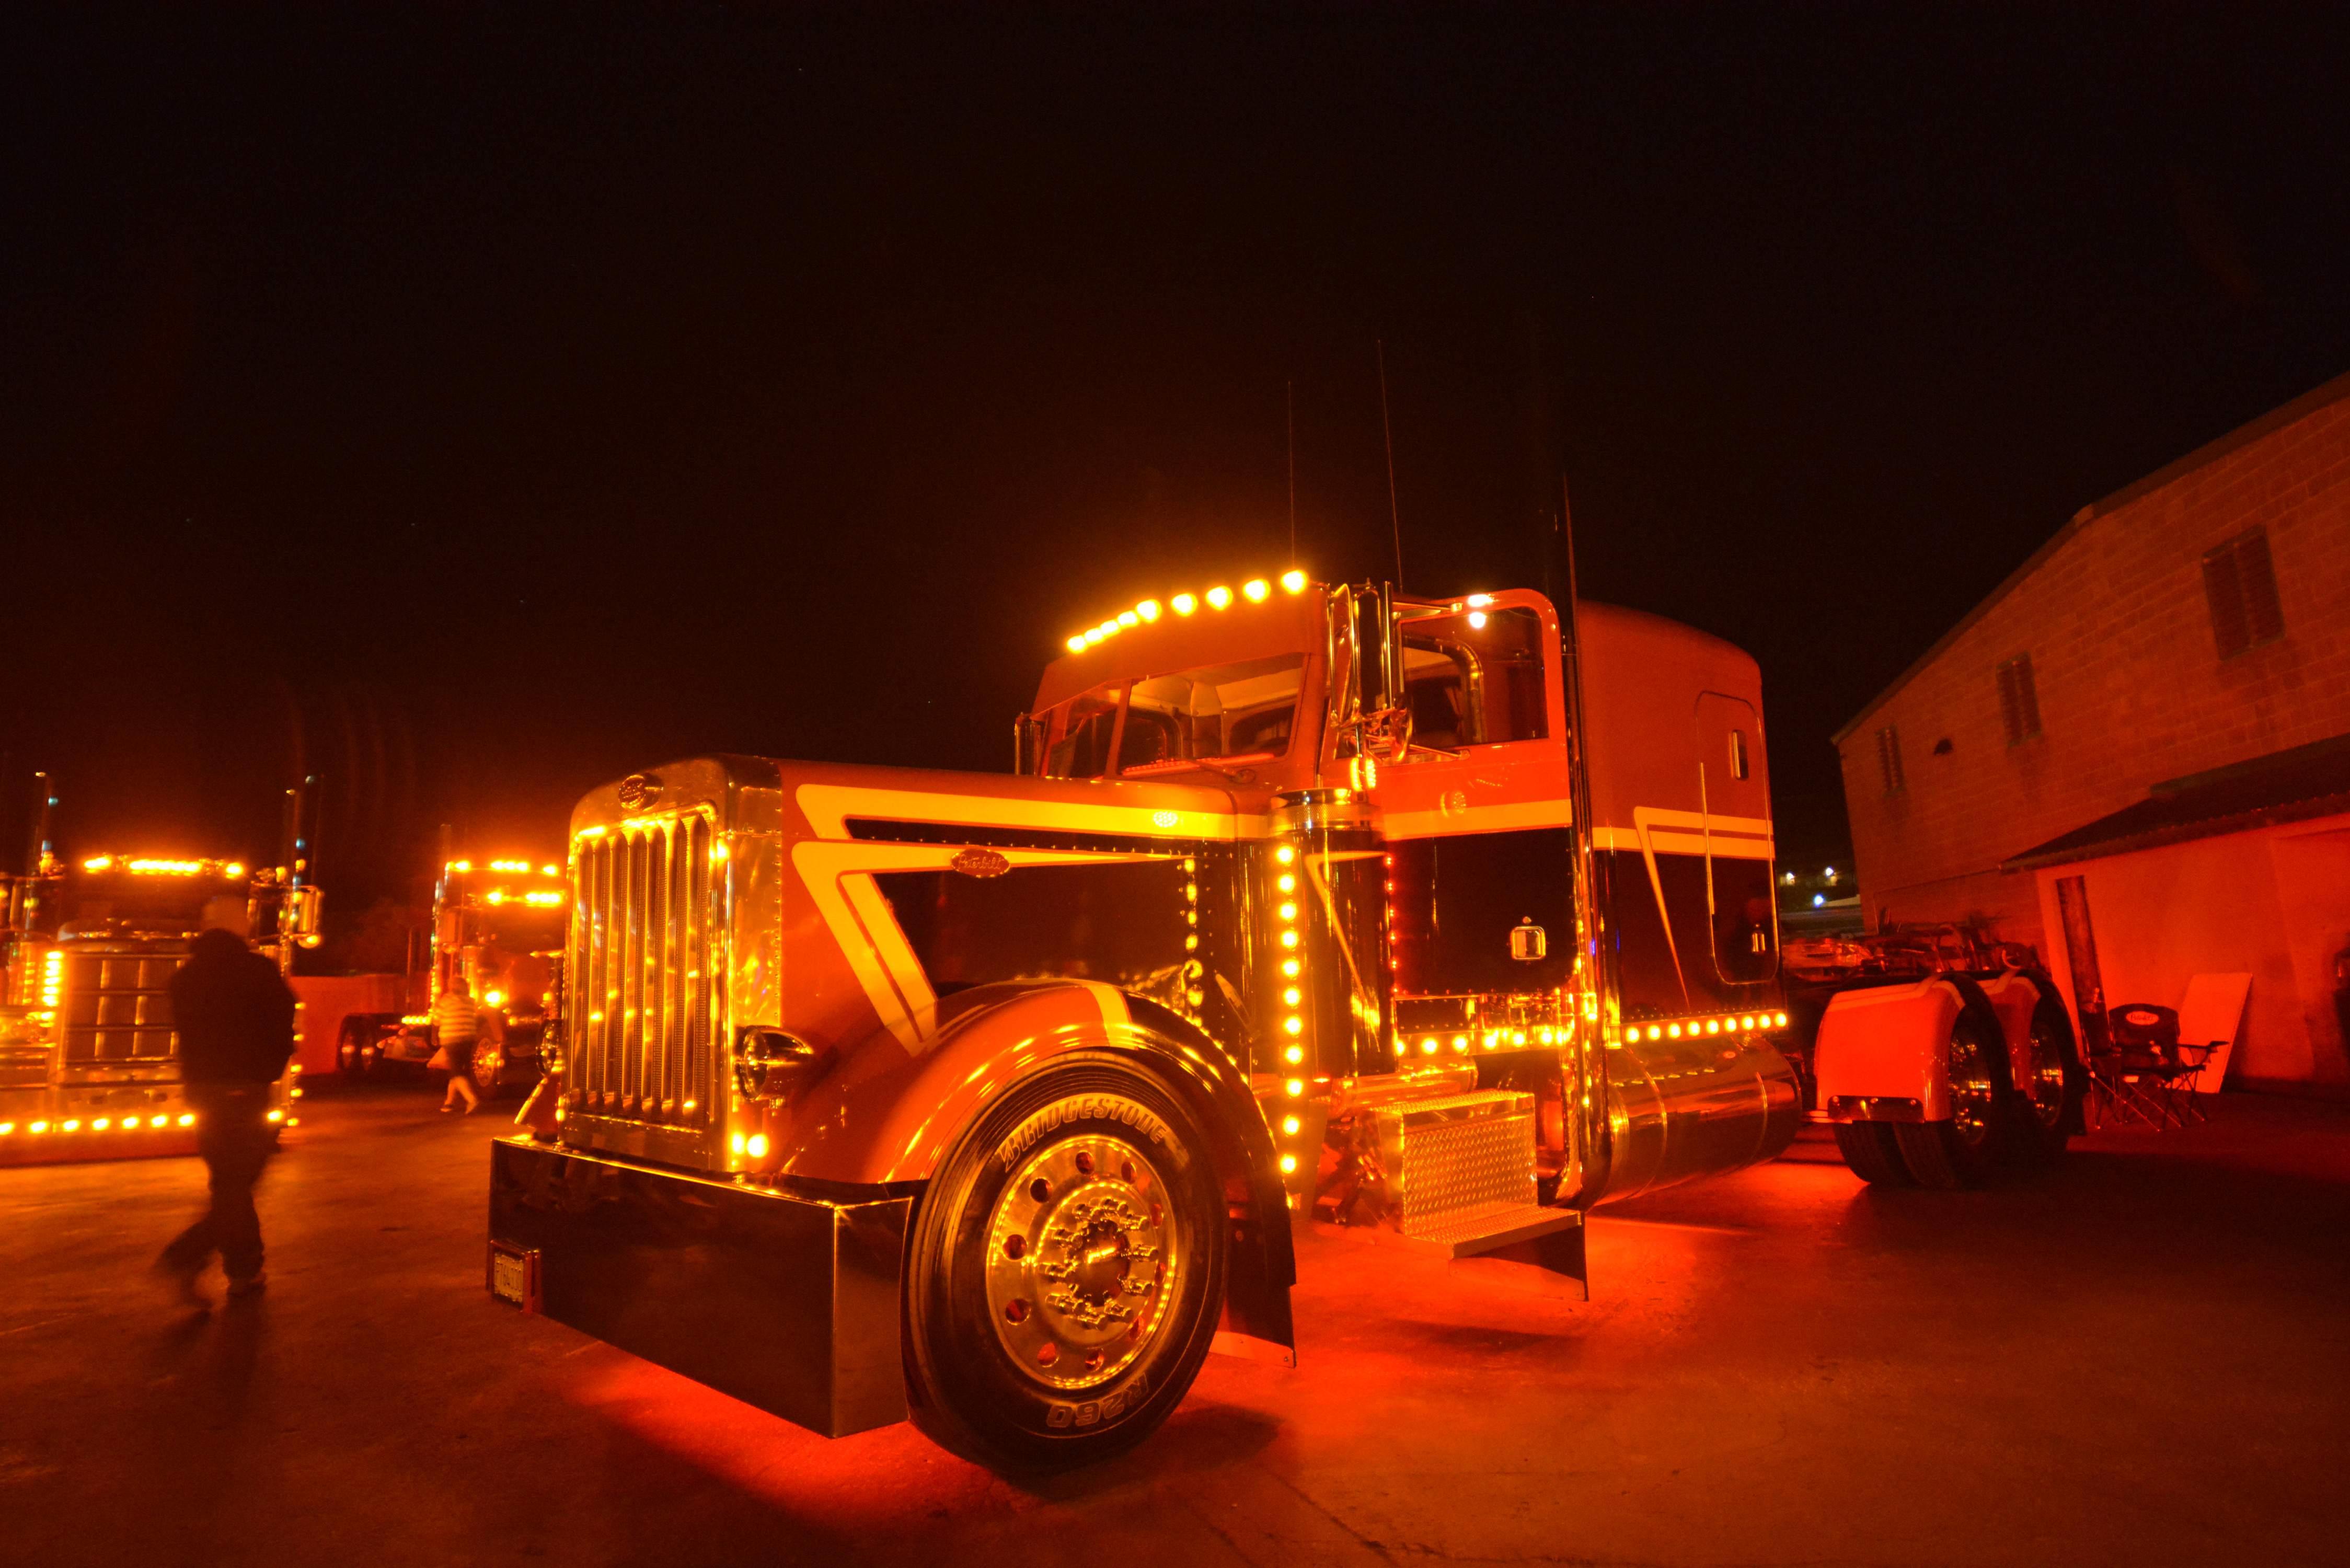 DSC_0281 DSC_0285 DSC_0332 DSC_0292 & Gallery: Truck light show at PDI Pride u0026 Polish